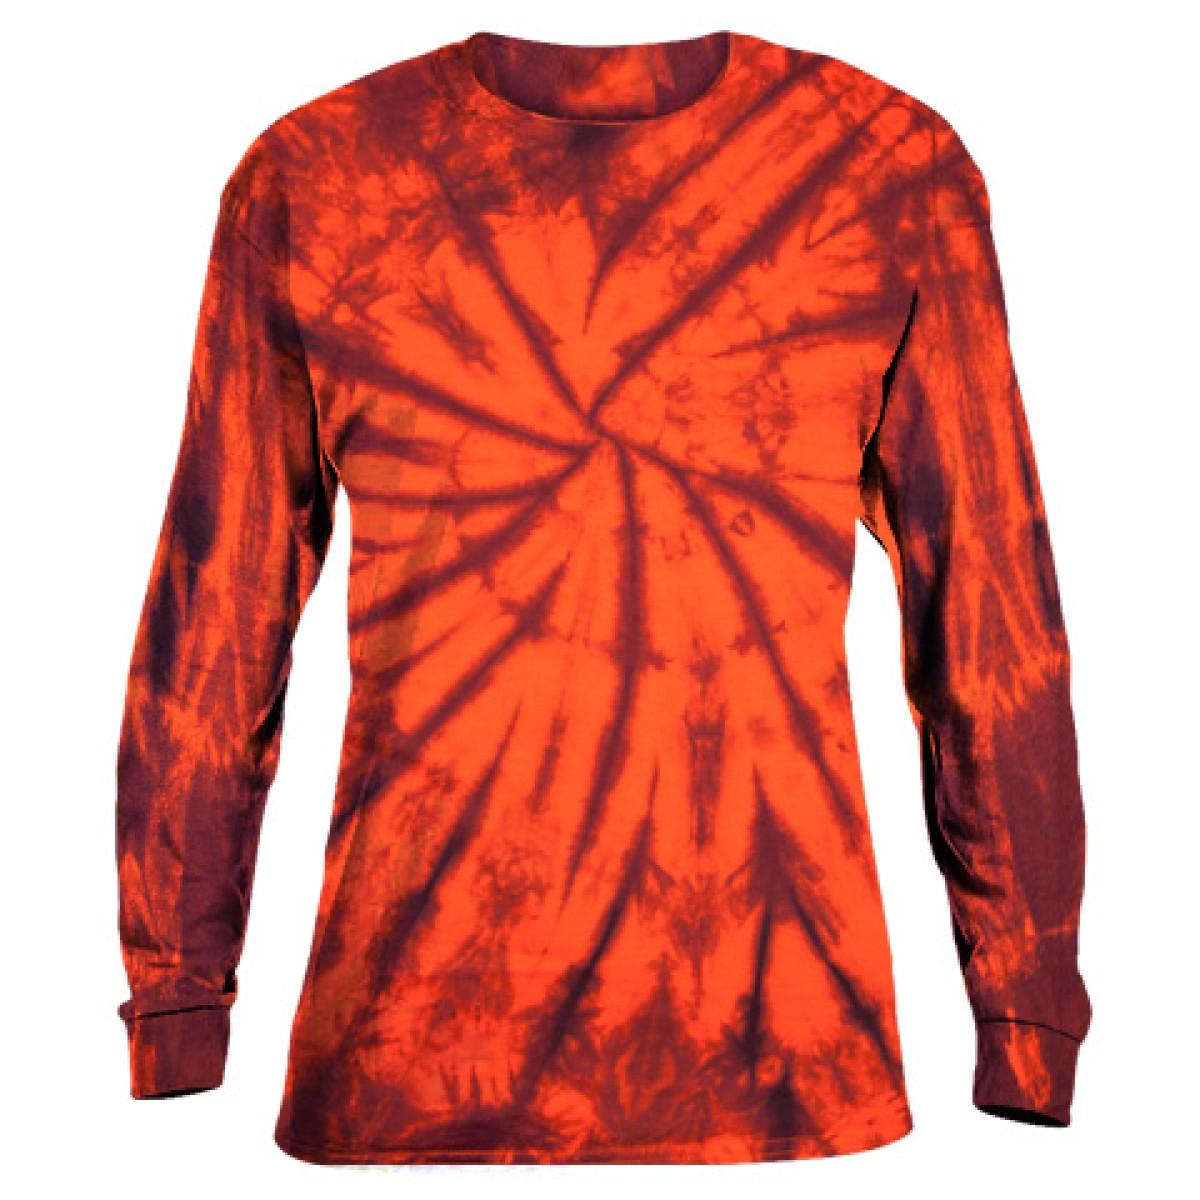 Tie-Dye Long Sleeve Shirt -Orange-YS